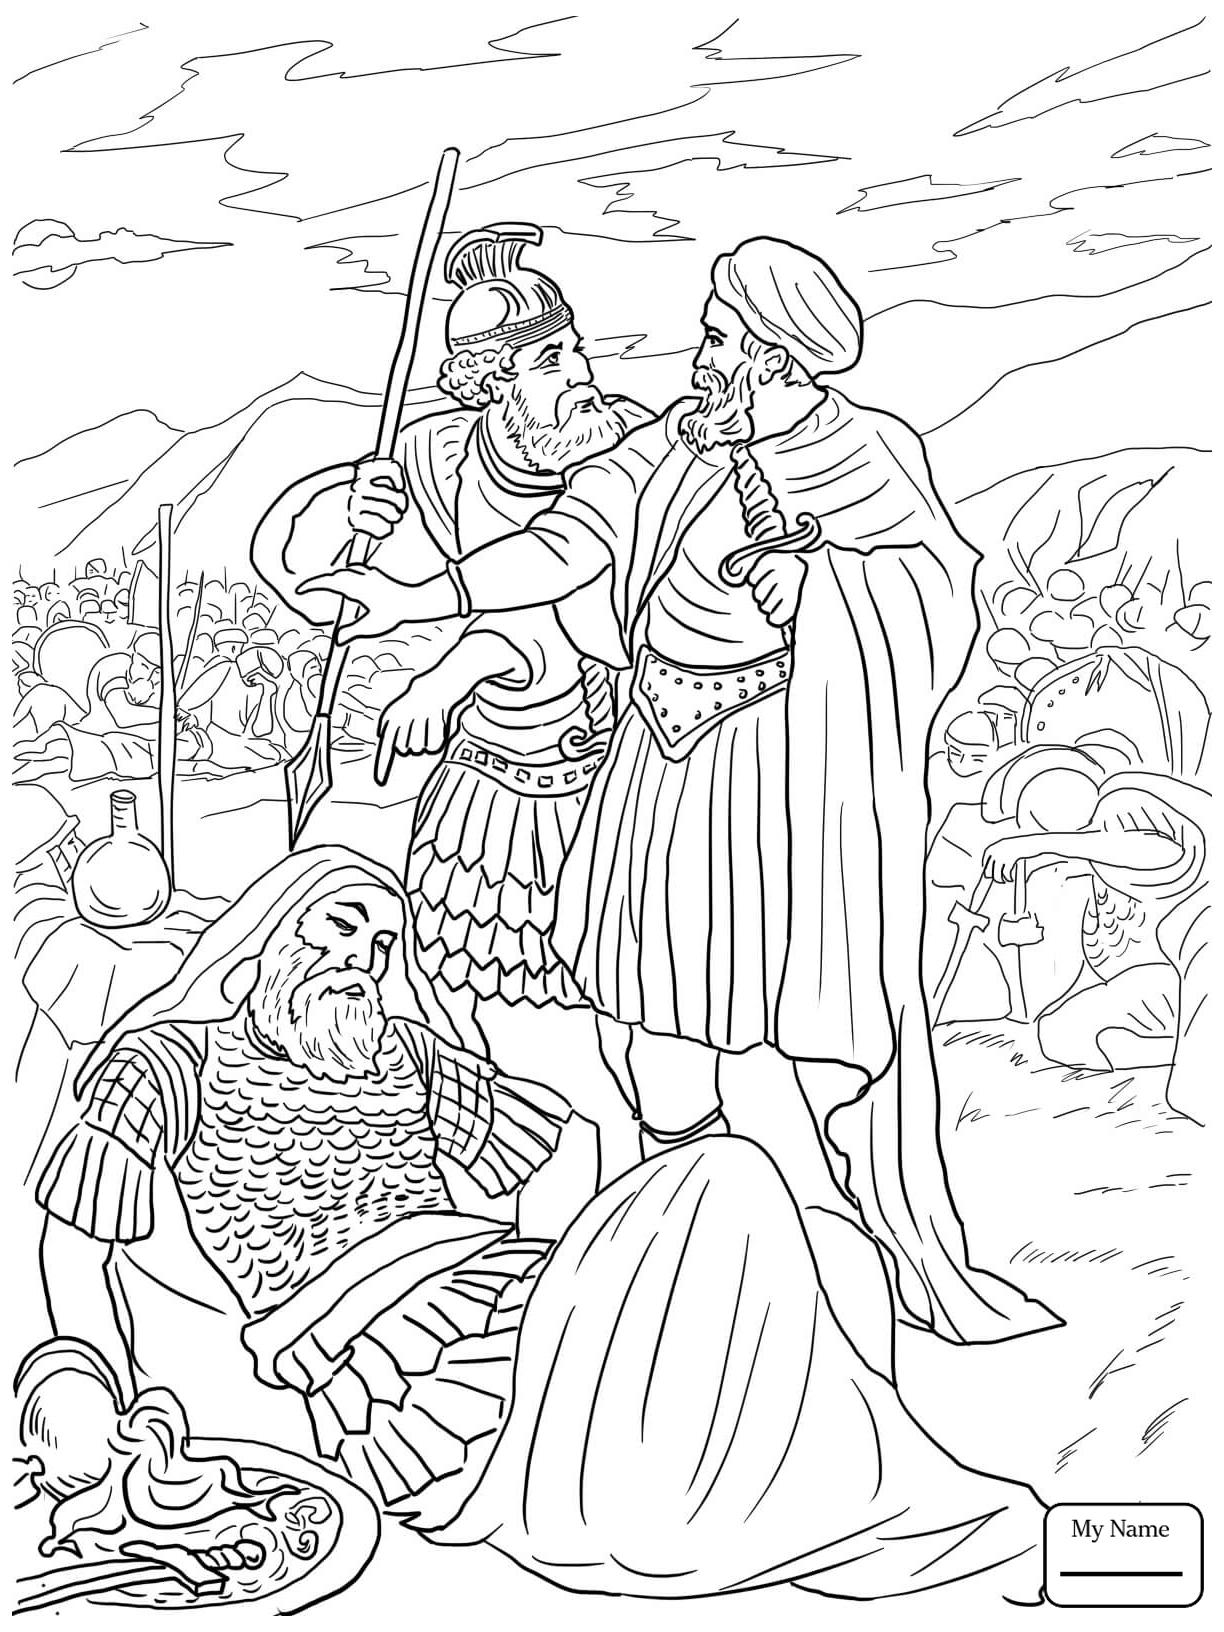 King David Drawing at GetDrawings.com | Free for personal ...